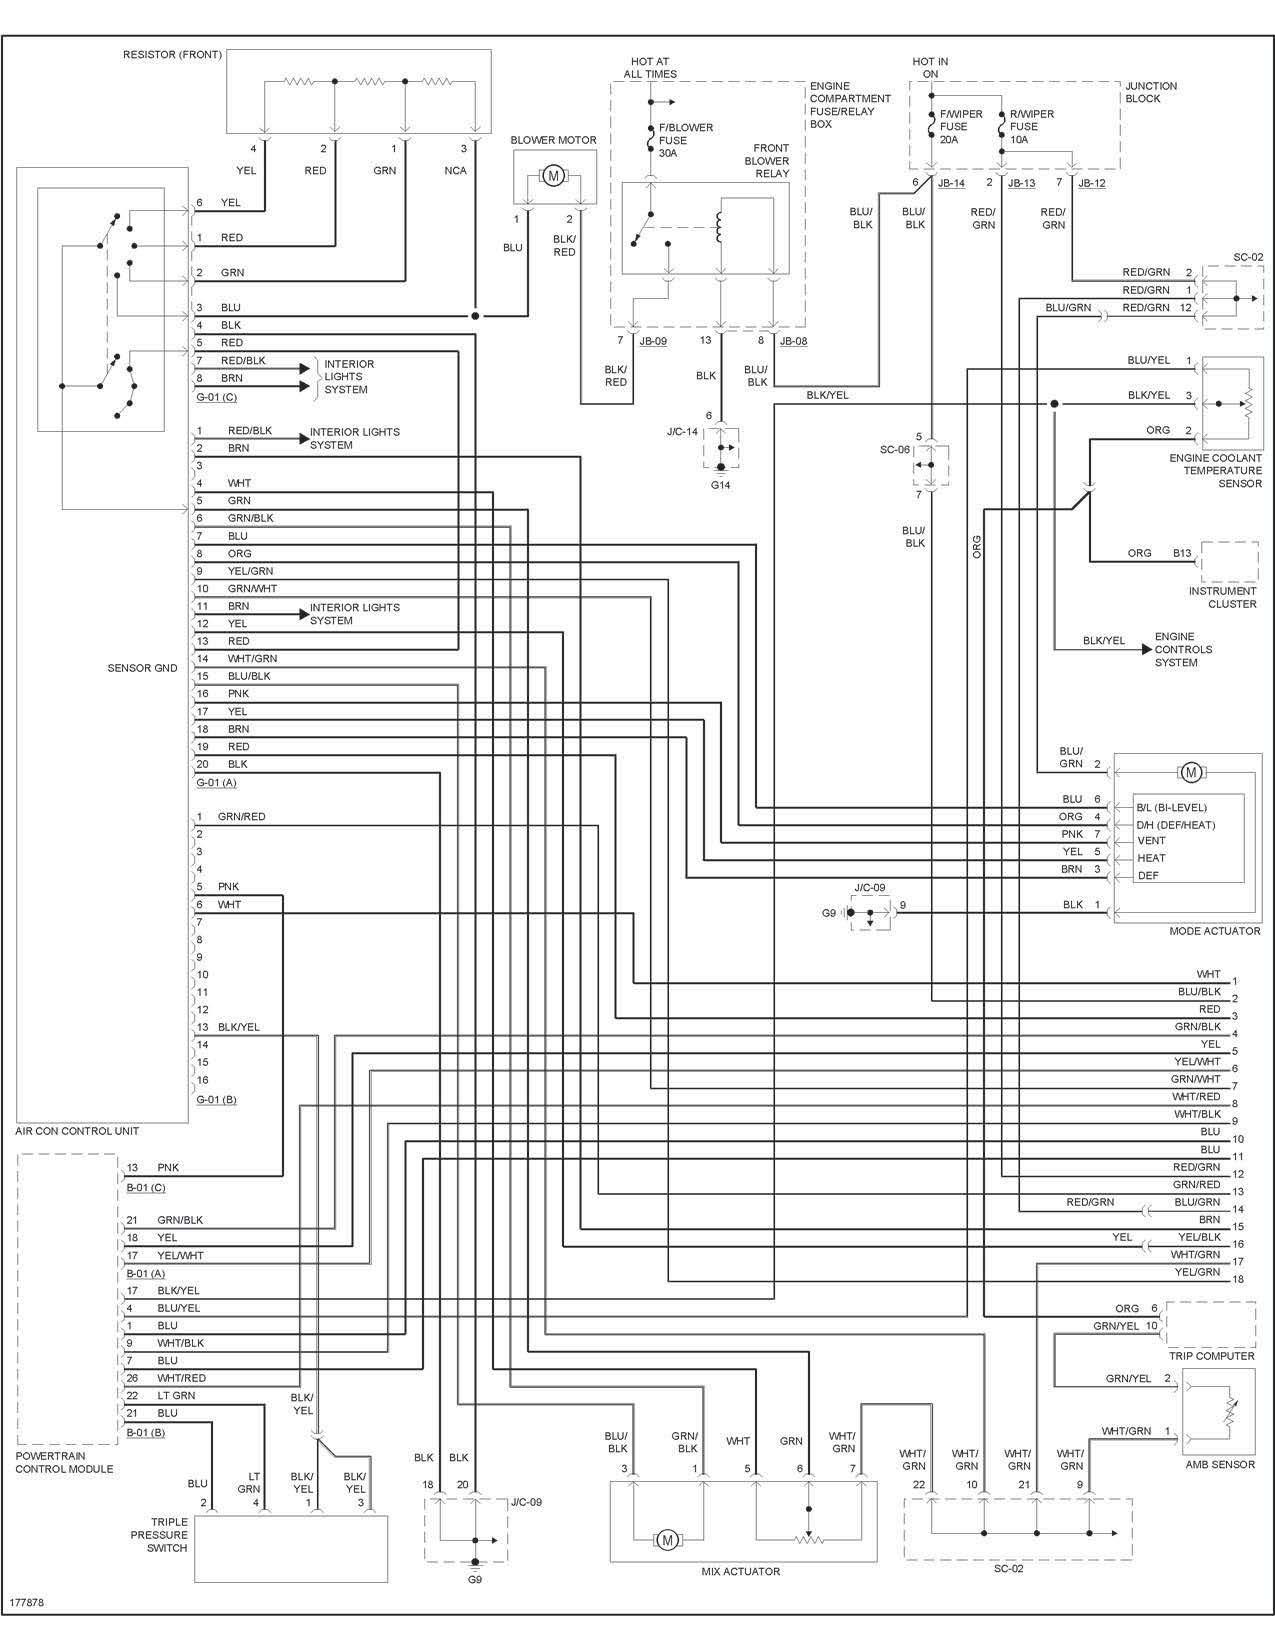 Wiring Diagram Kia Carnival 2005 - Wiring Diagram Online on